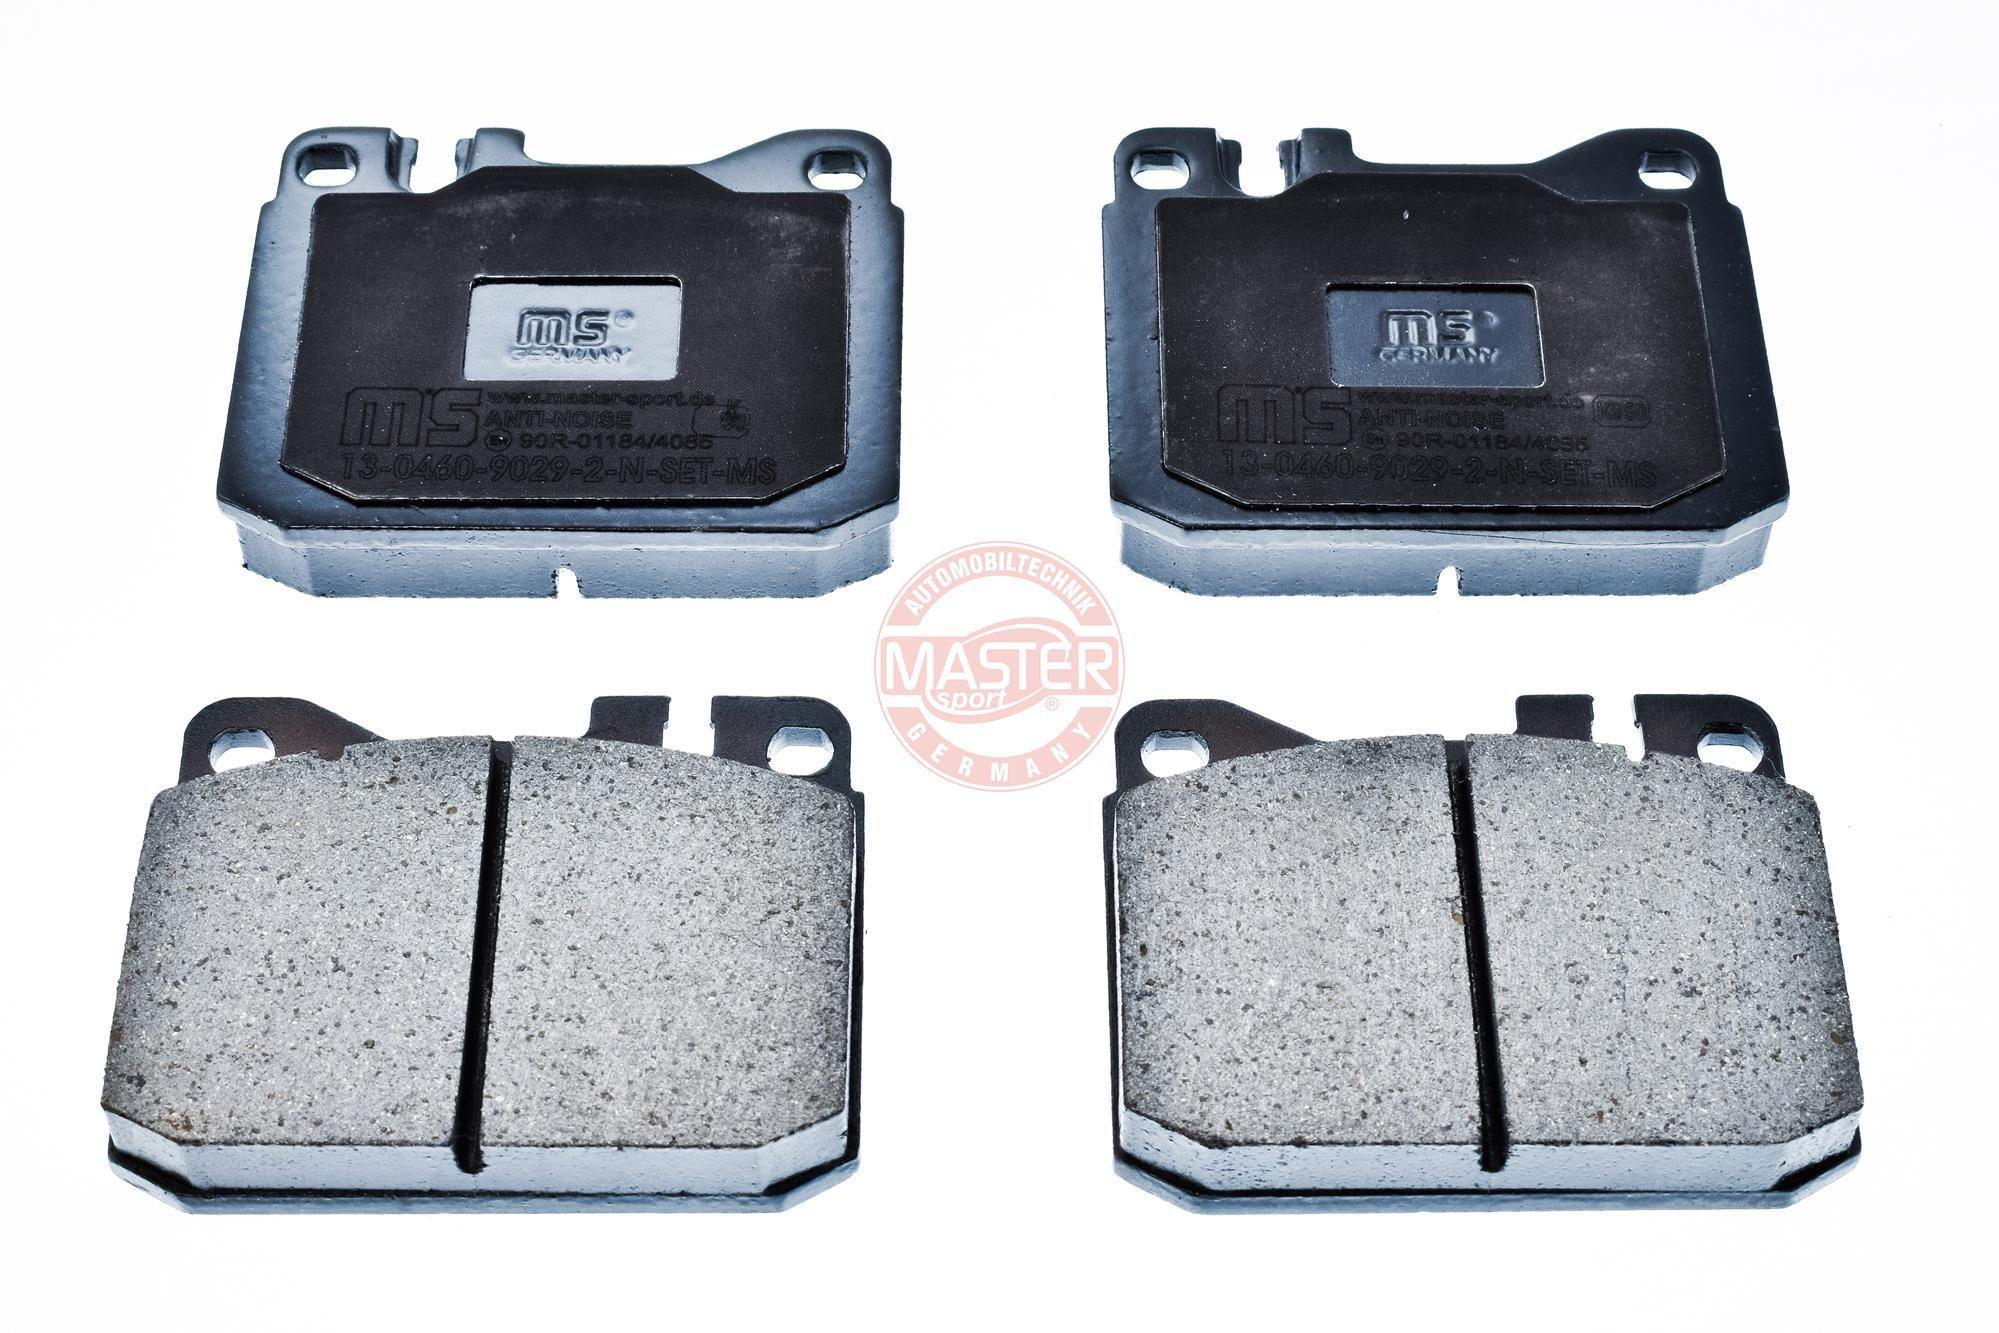 Bremsbeläge 13046090292N-SET-MS MASTER-SPORT 236090292 in Original Qualität